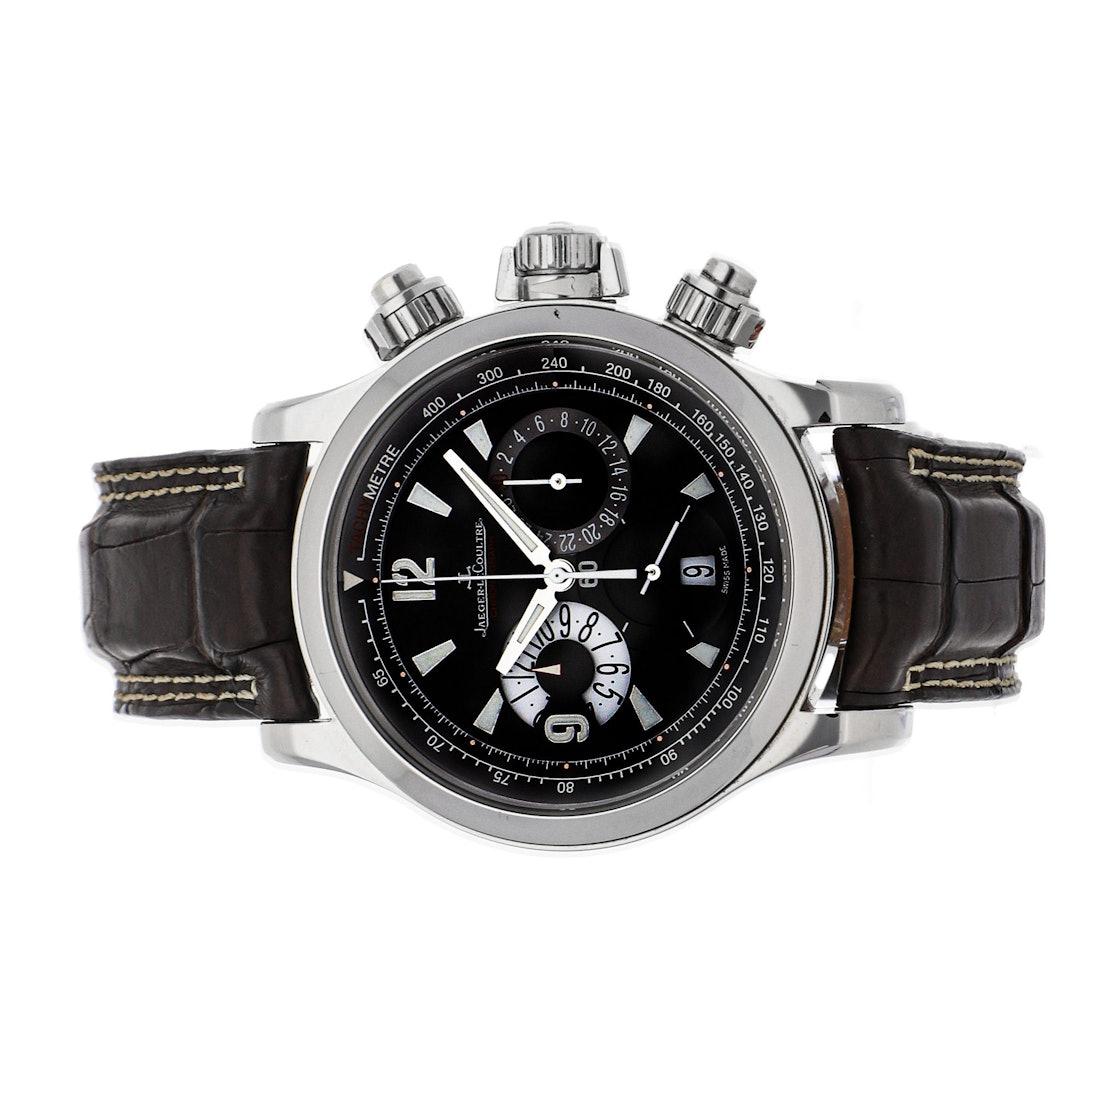 Jaeger-LeCoultre Master Compressor Chronograph Q1758470